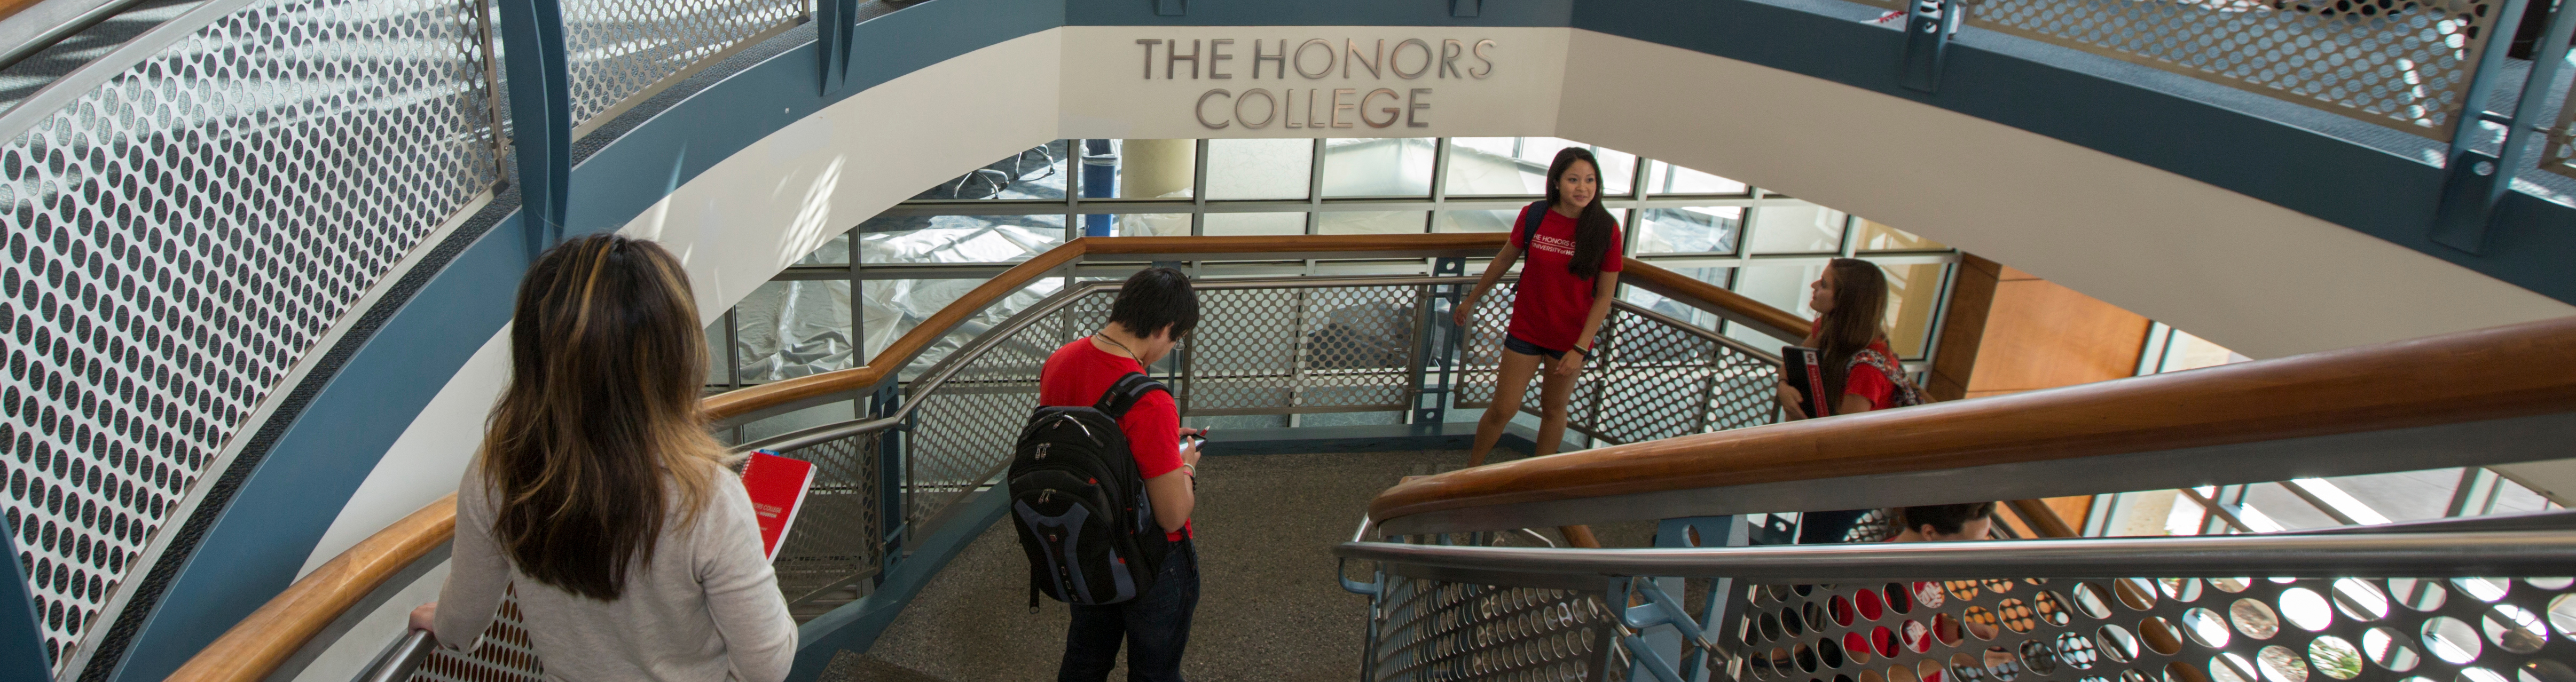 Calhoun honors college application essay